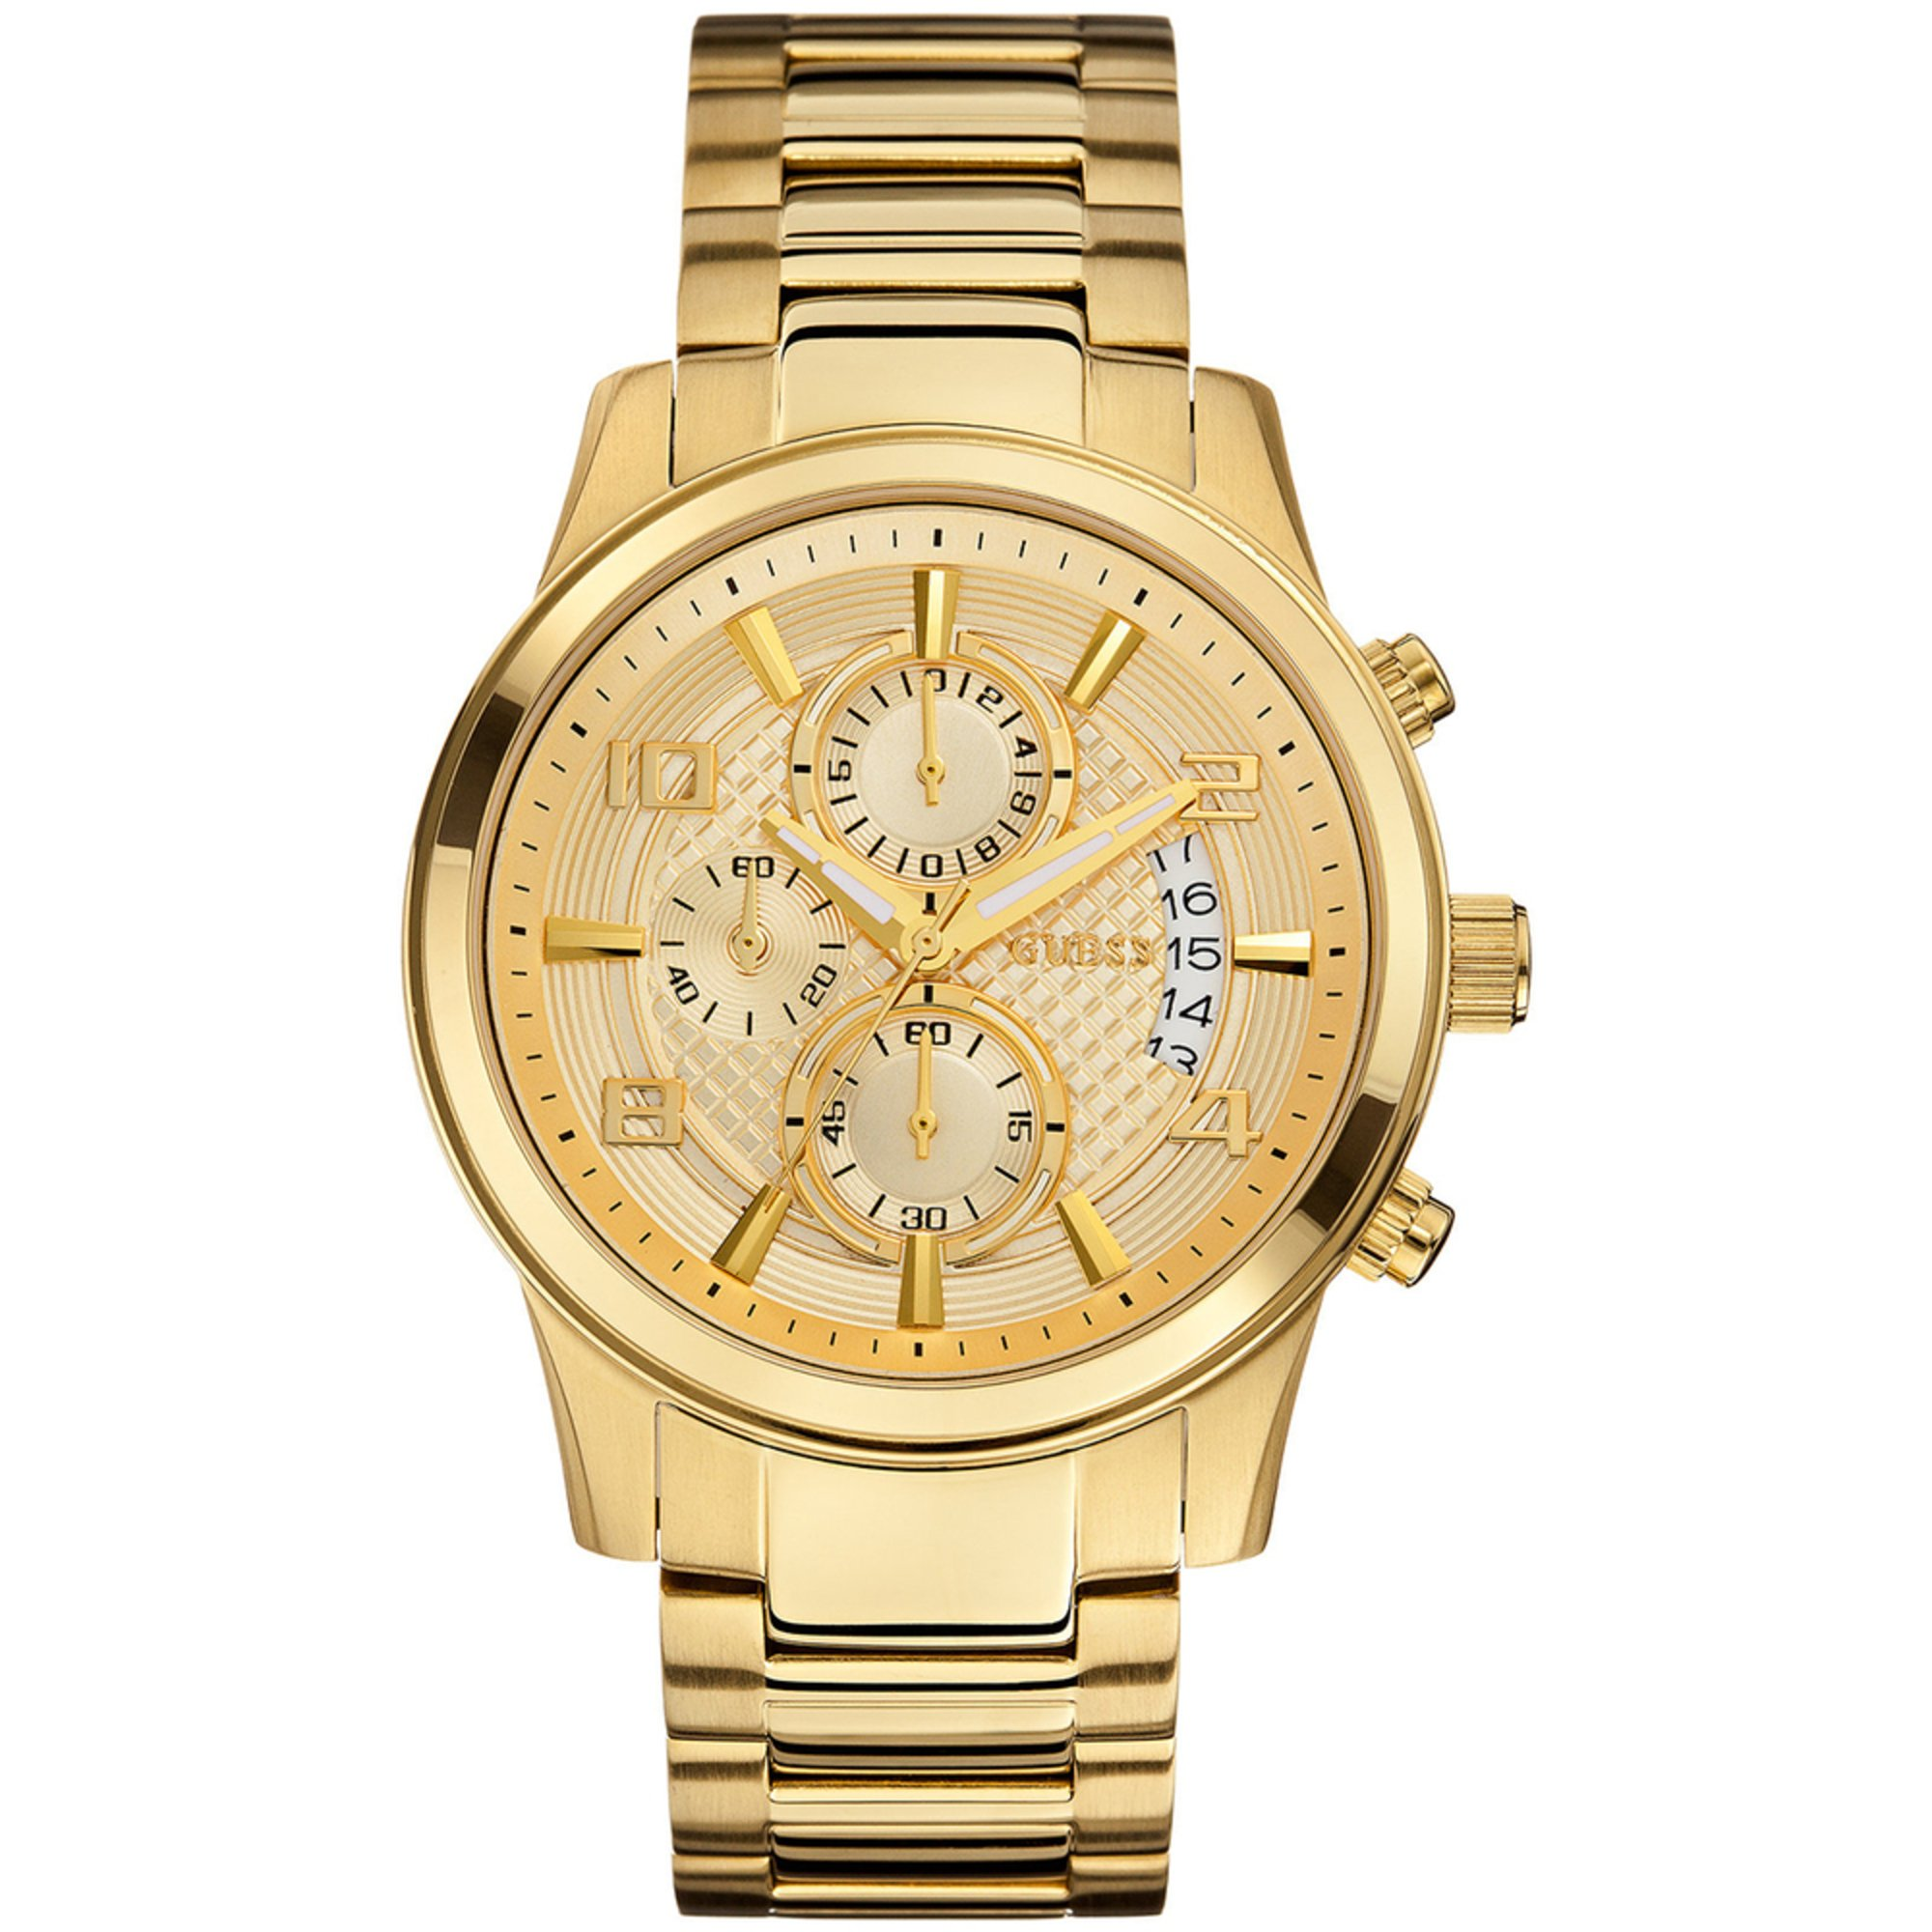 Guess Men's Chronograph Gold Tone Bracelet Watch, 44mm ...